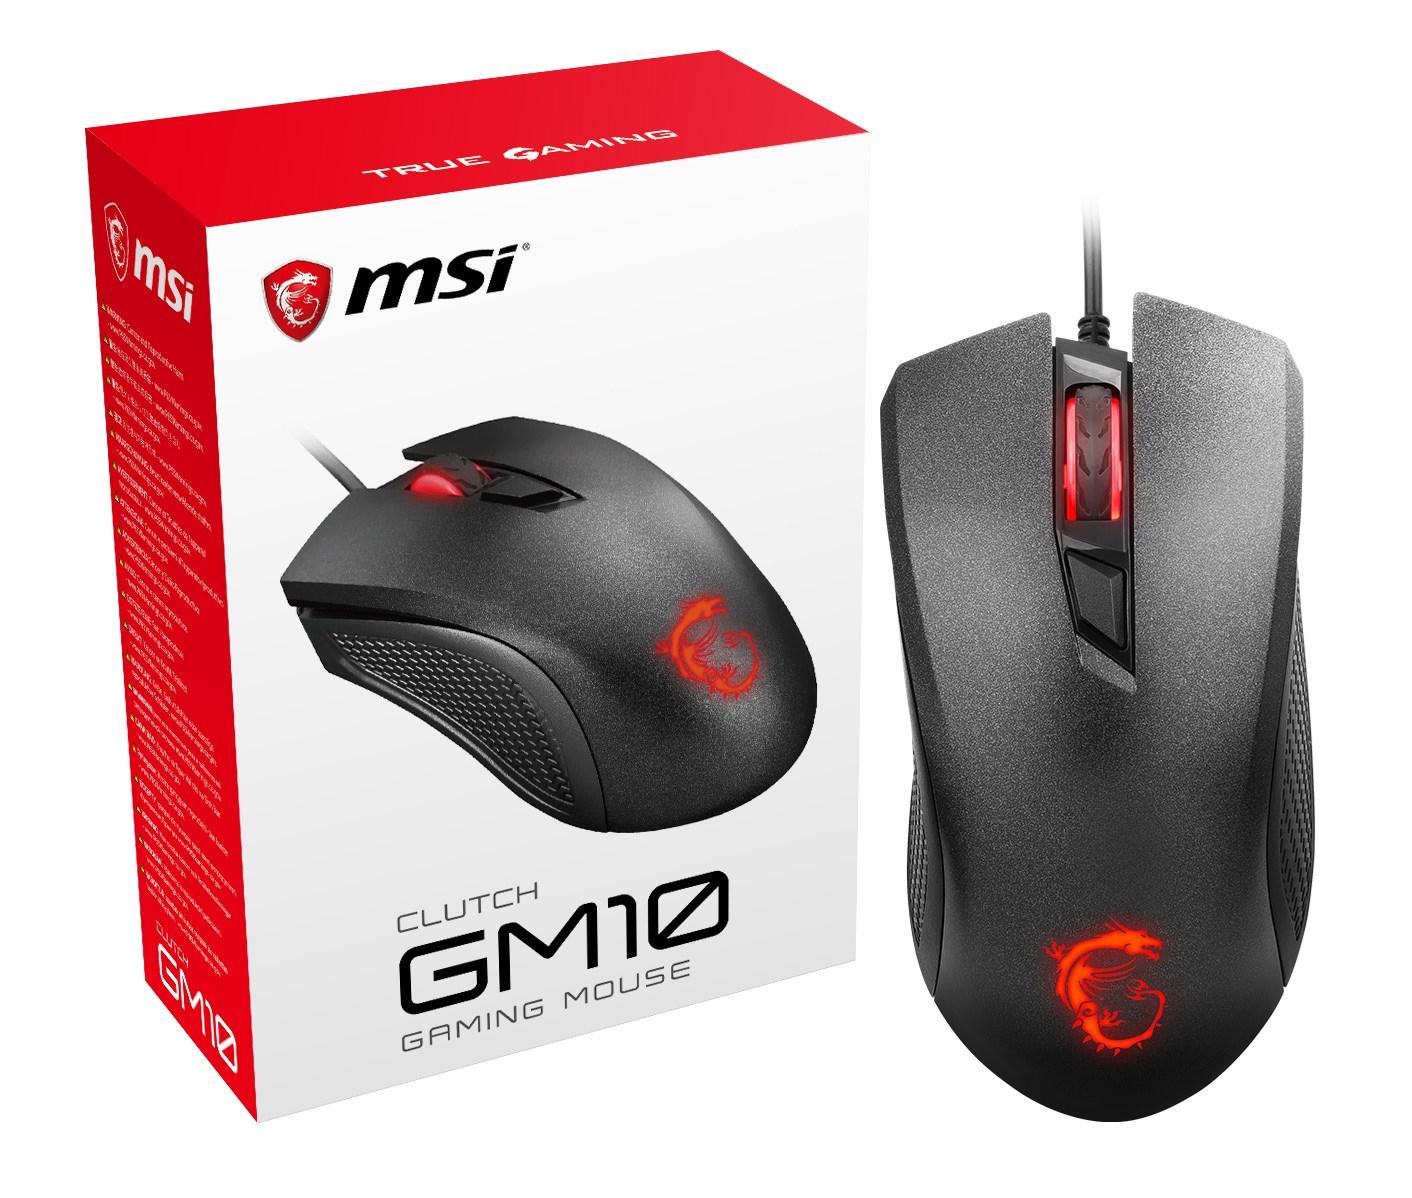 b46072fad49 MSI Clutch GM10 USB Wired Desktop Mouse with Optical Sensor (Black ...